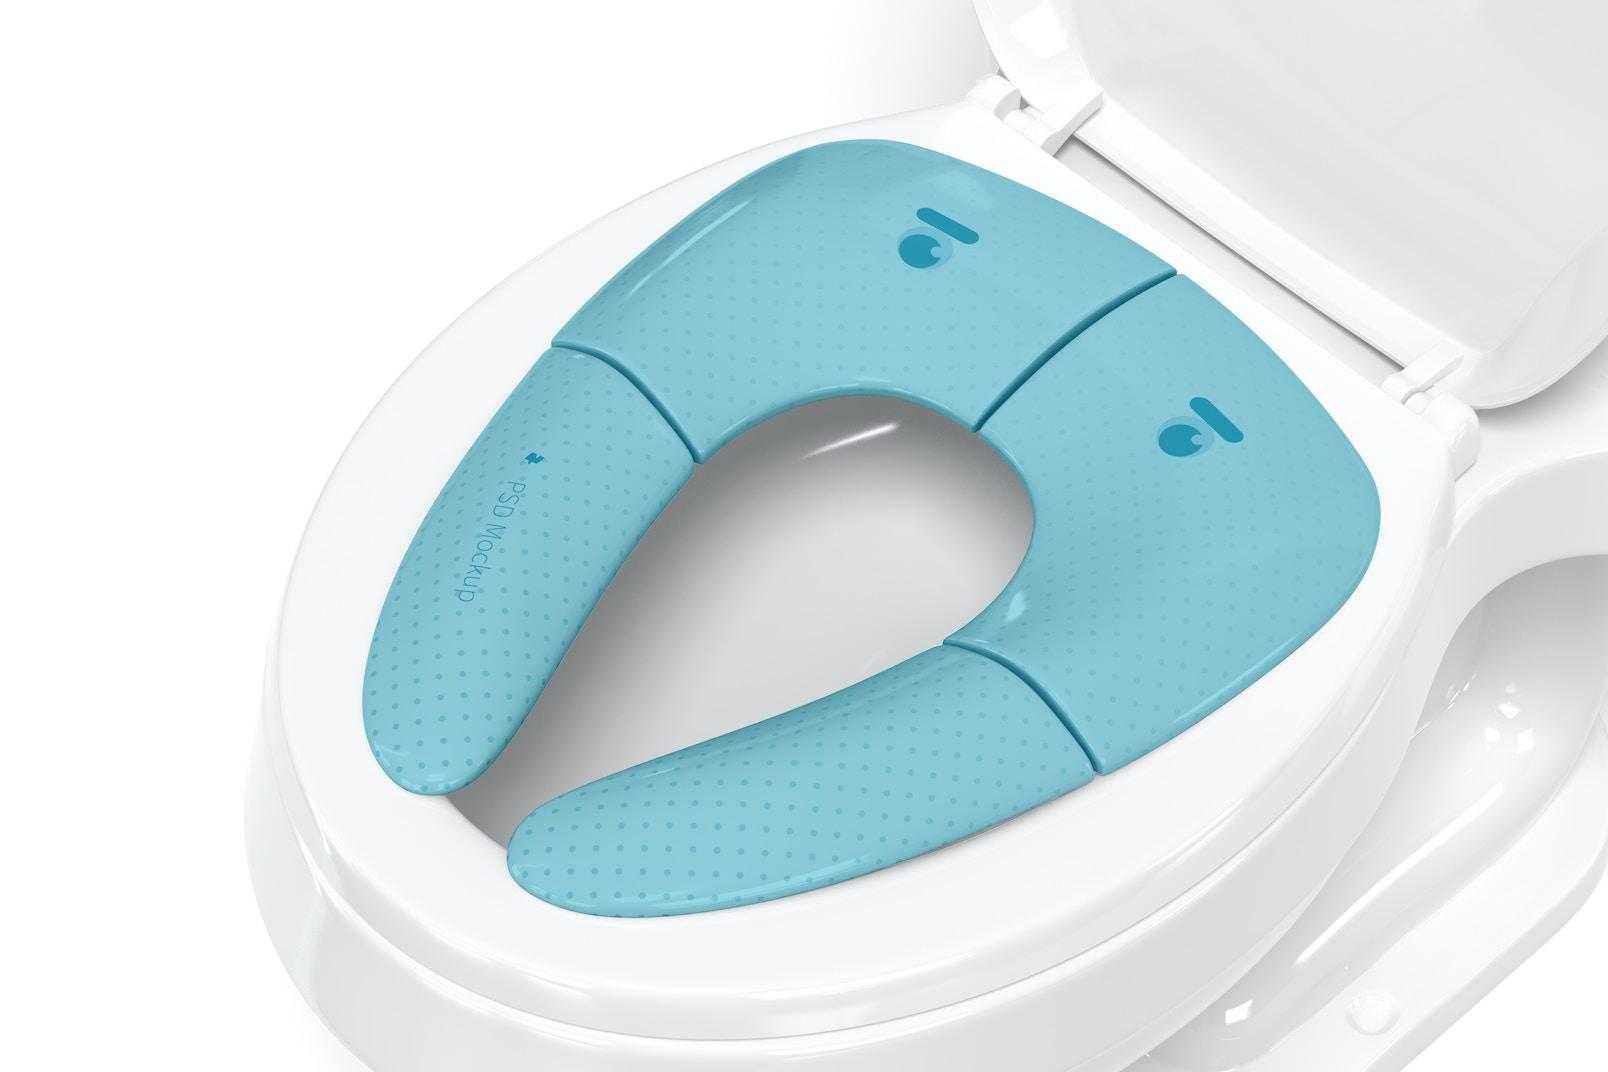 Travel Folding Potty Seat Mockup, Close Up